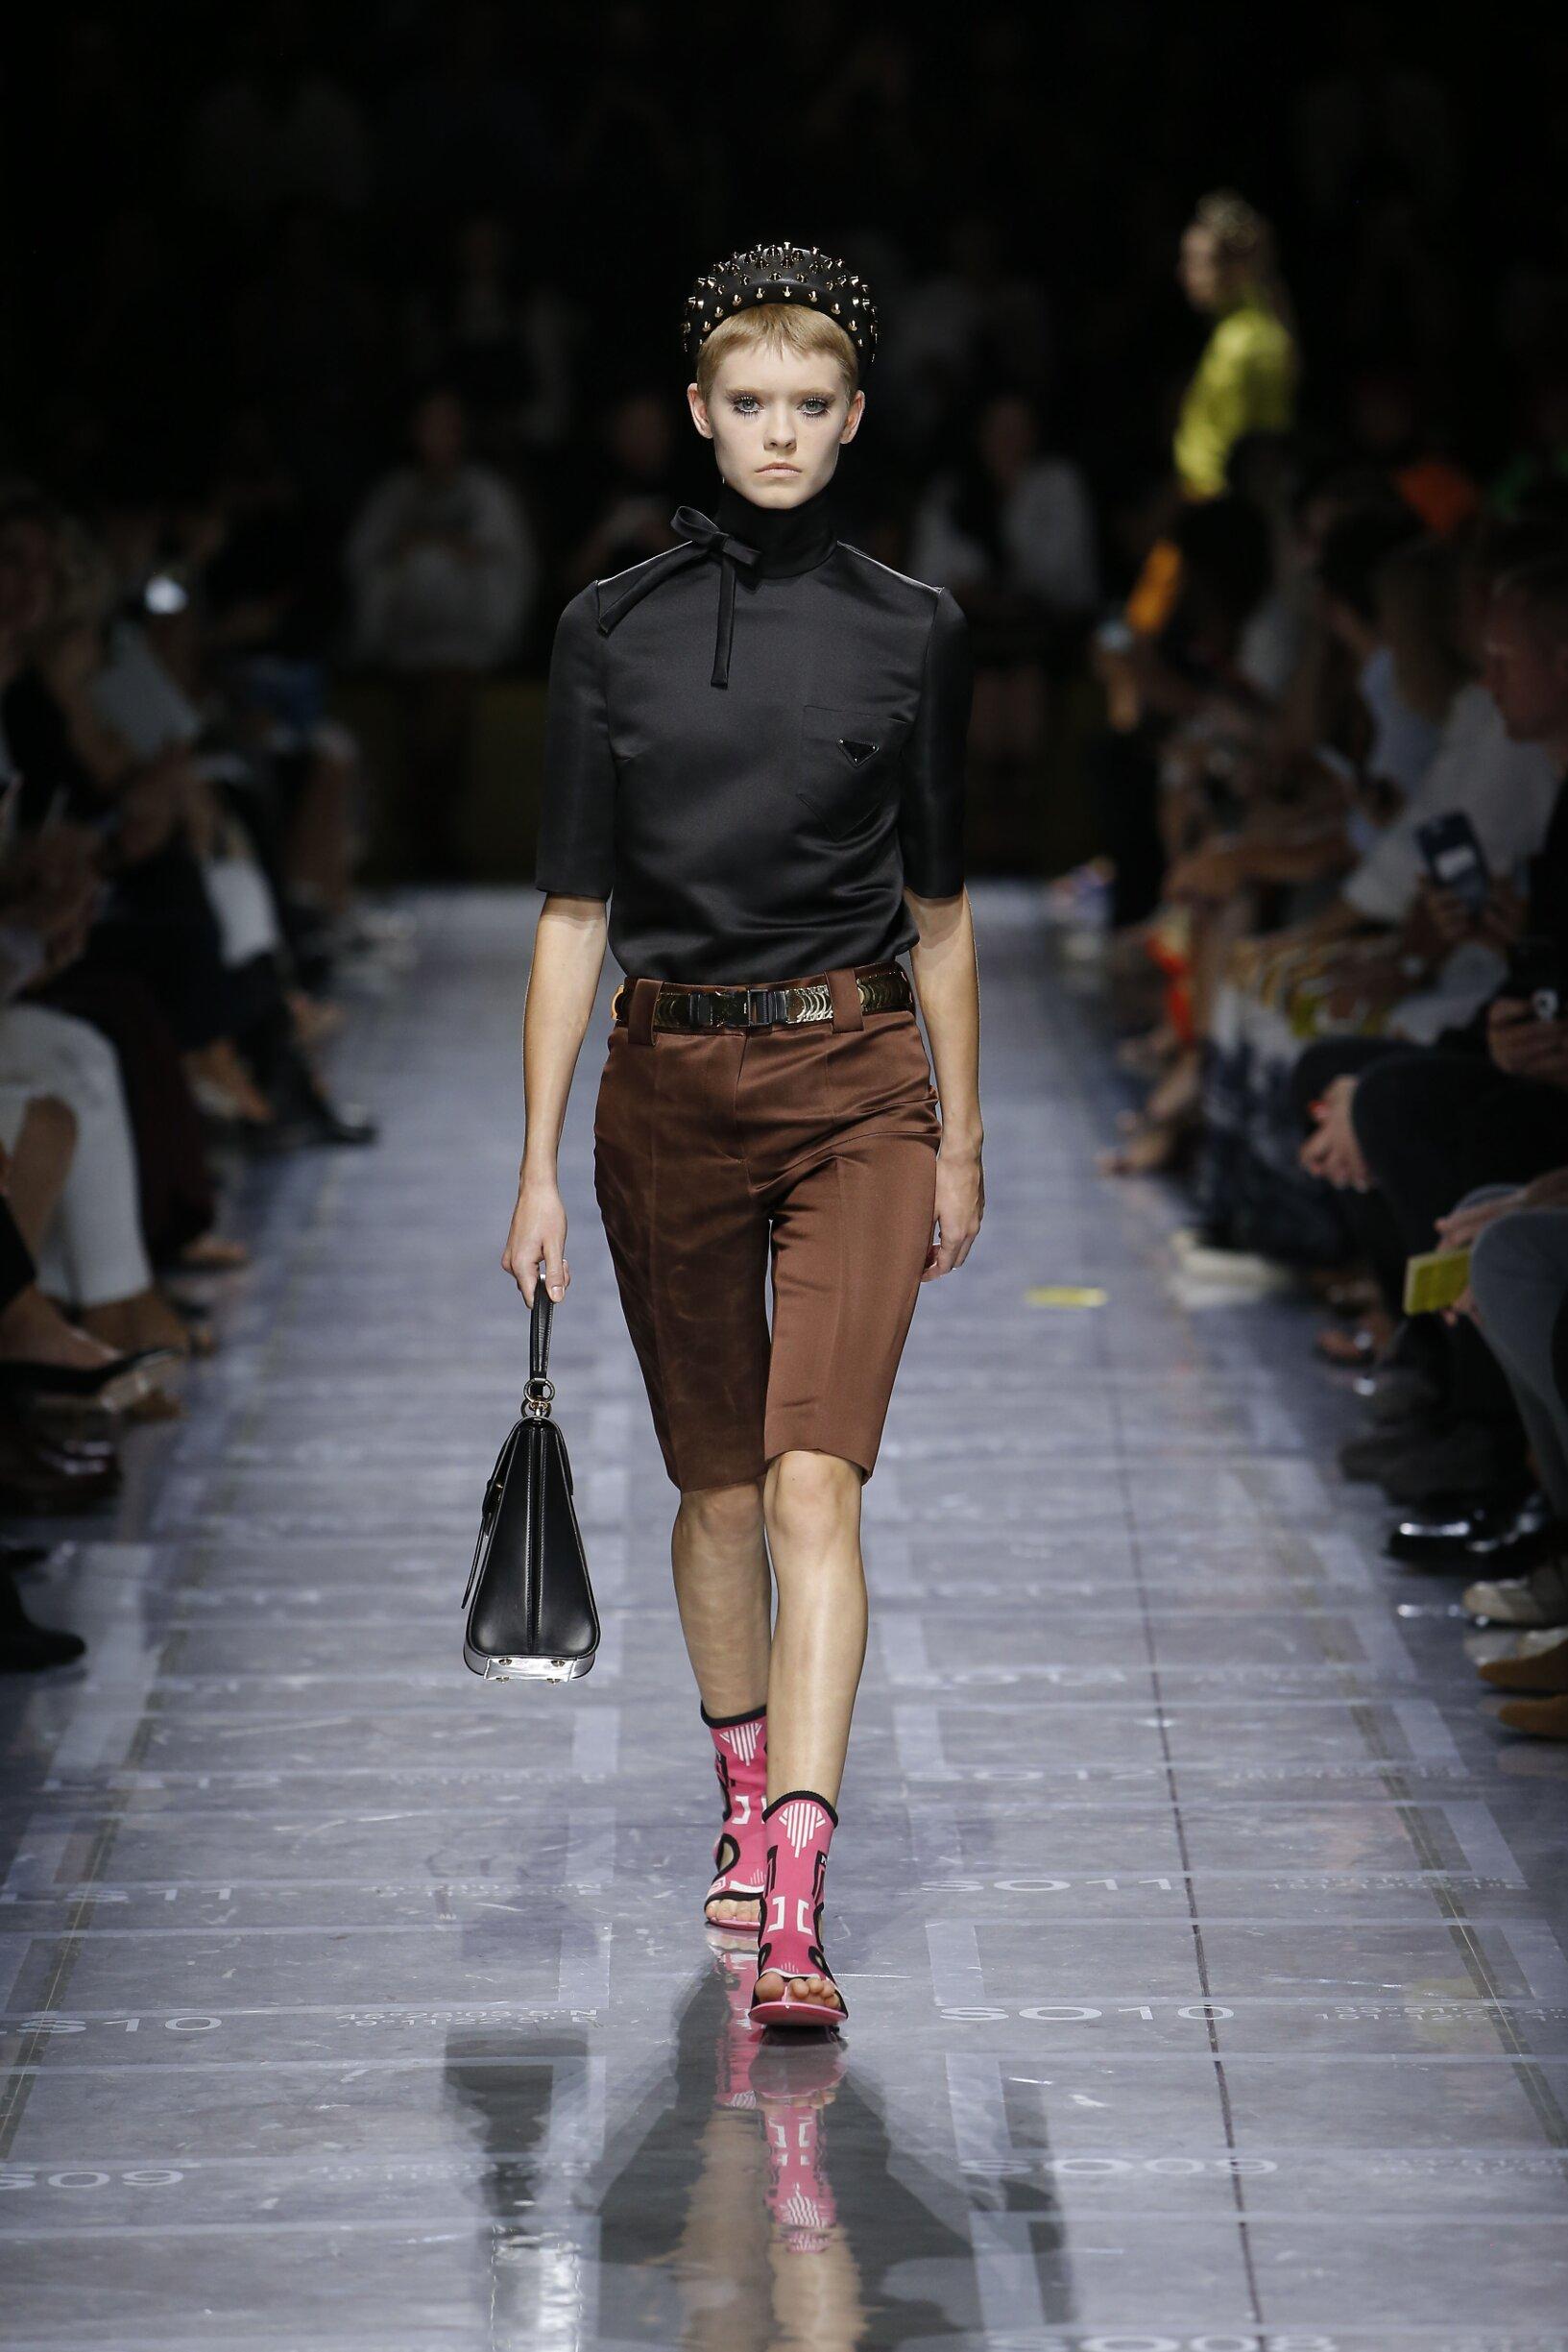 Prada Fashion Show SS 2019